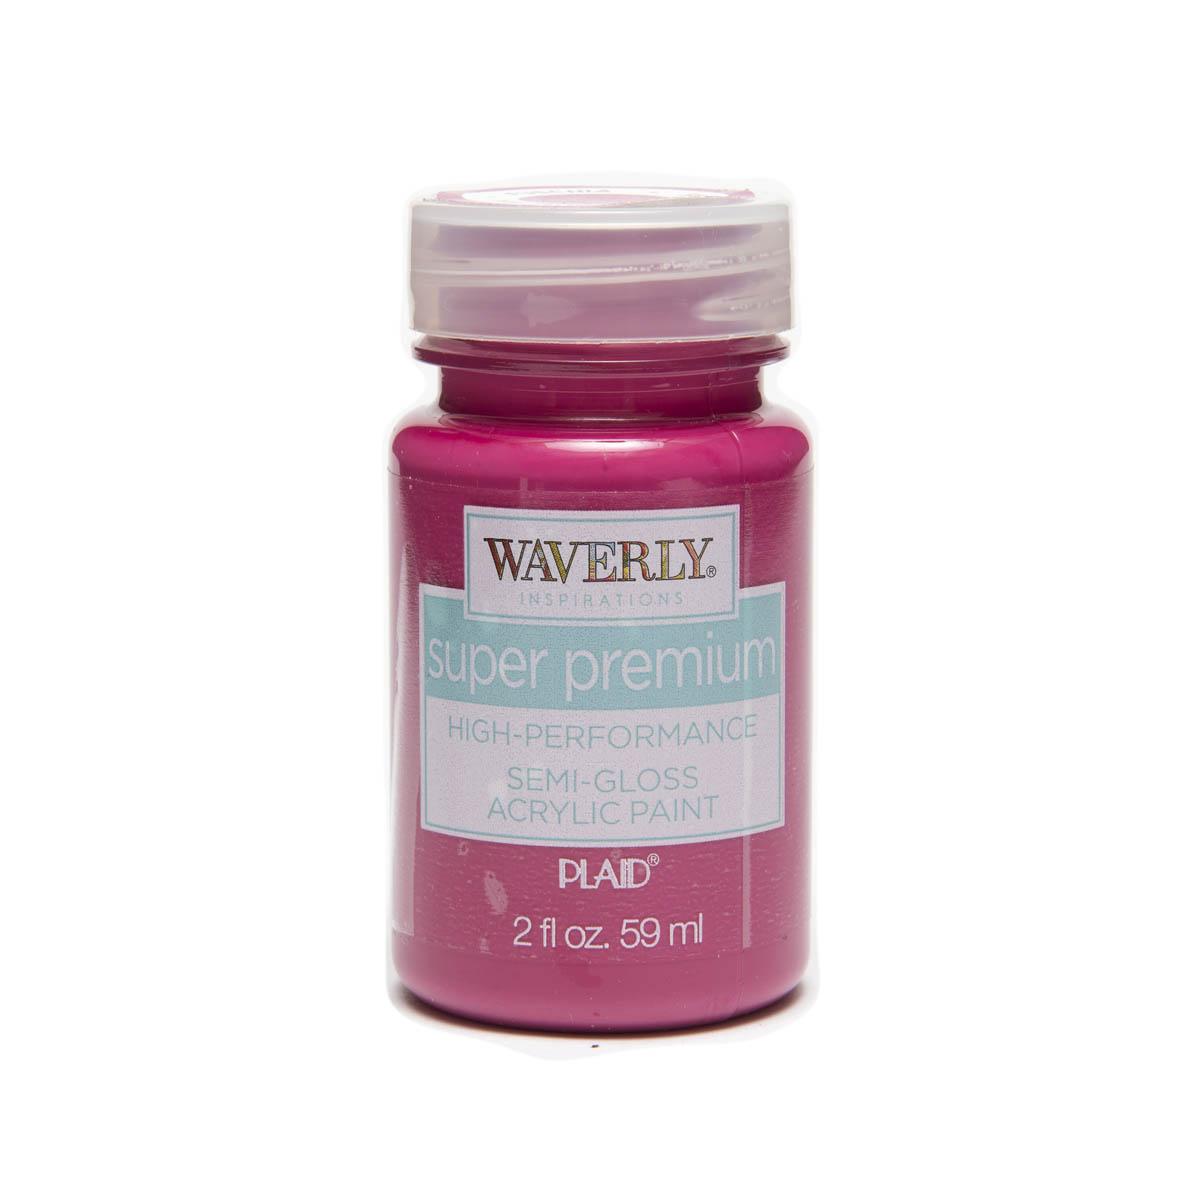 Waverly ® Inspirations Super Premium Semi-Gloss Acrylic Paint - Fuchsia, 2 oz.